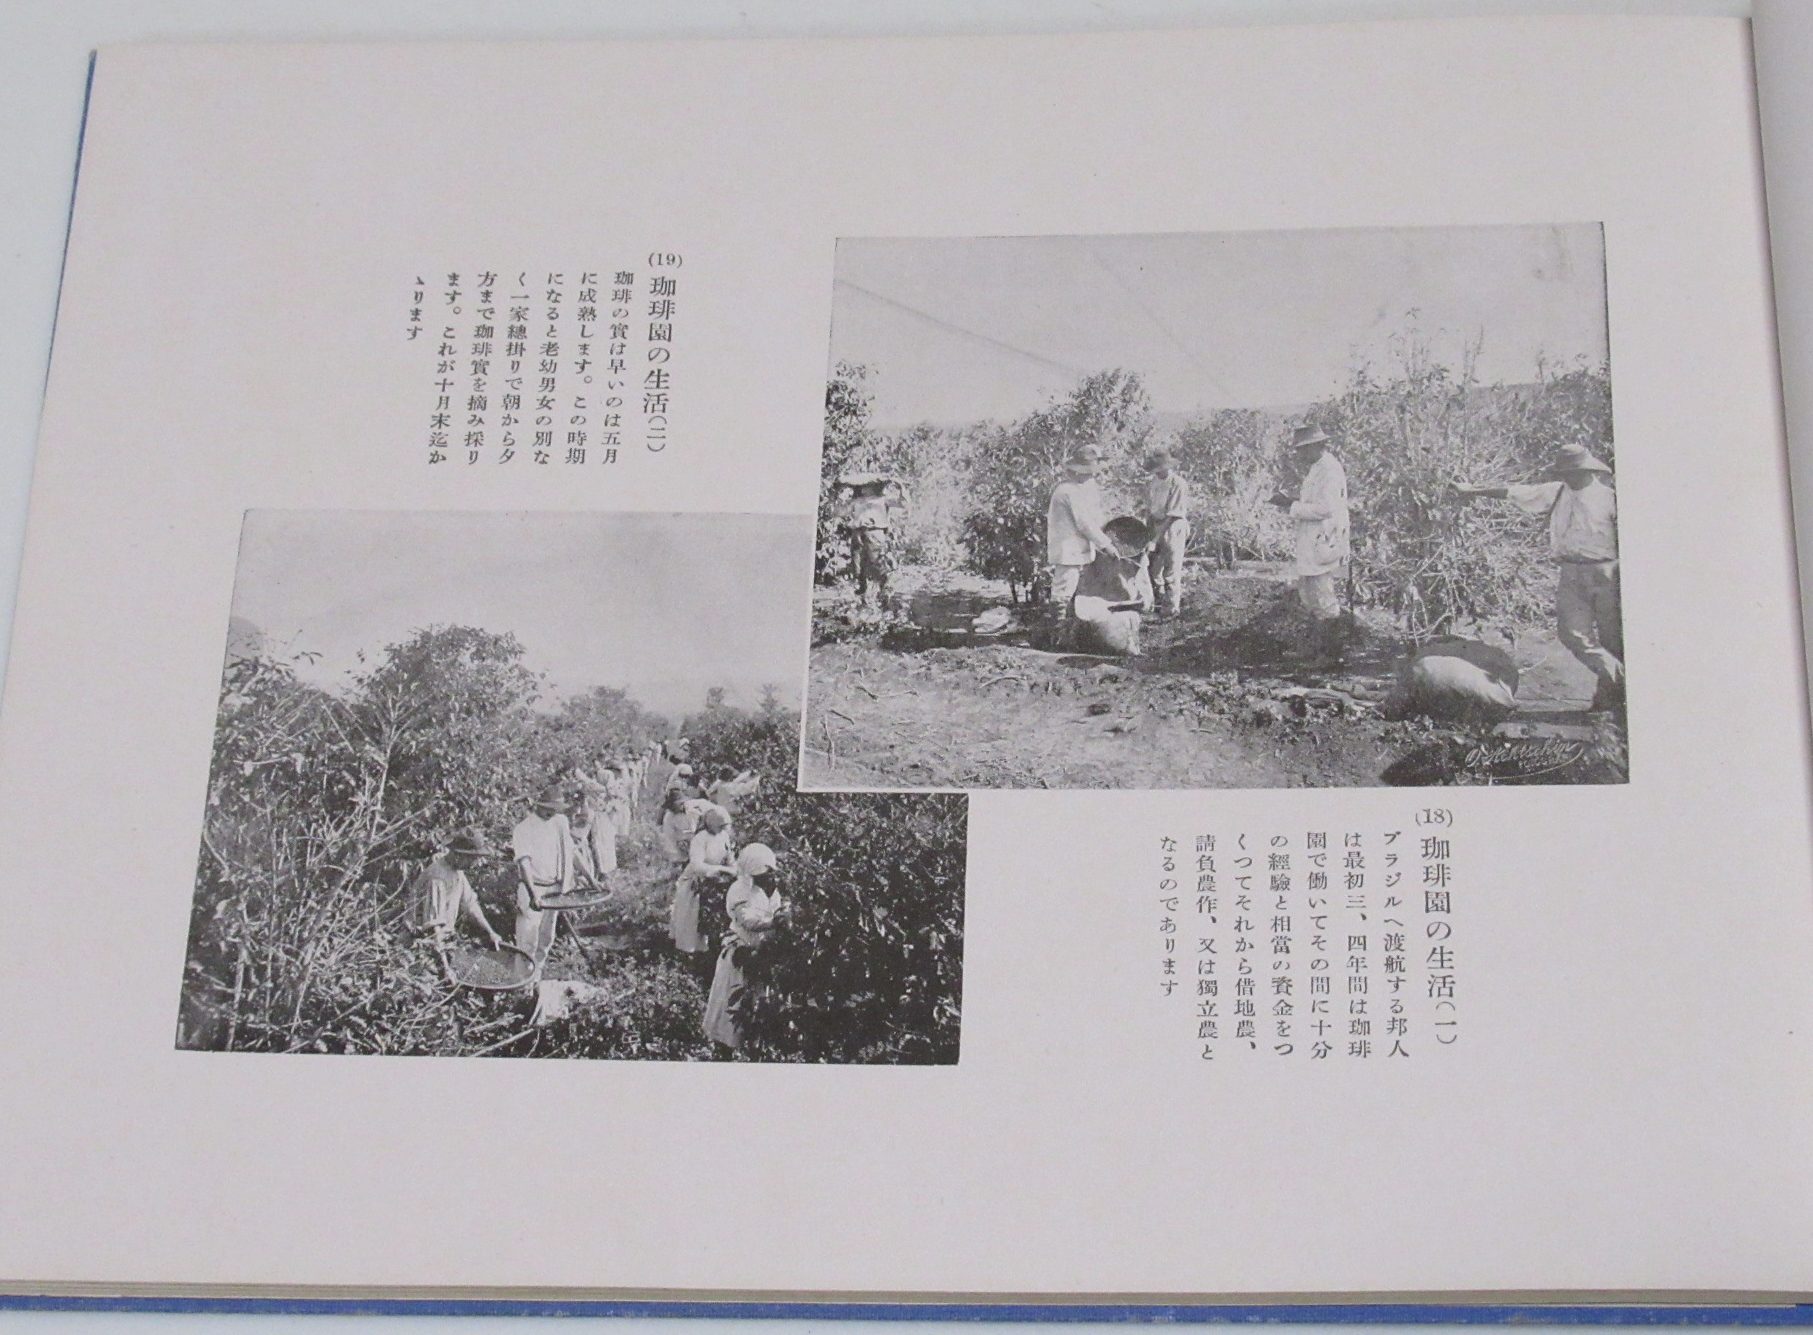 ブラジル写真帖 海外興行株式会社 昭和2年 移植民 植民地